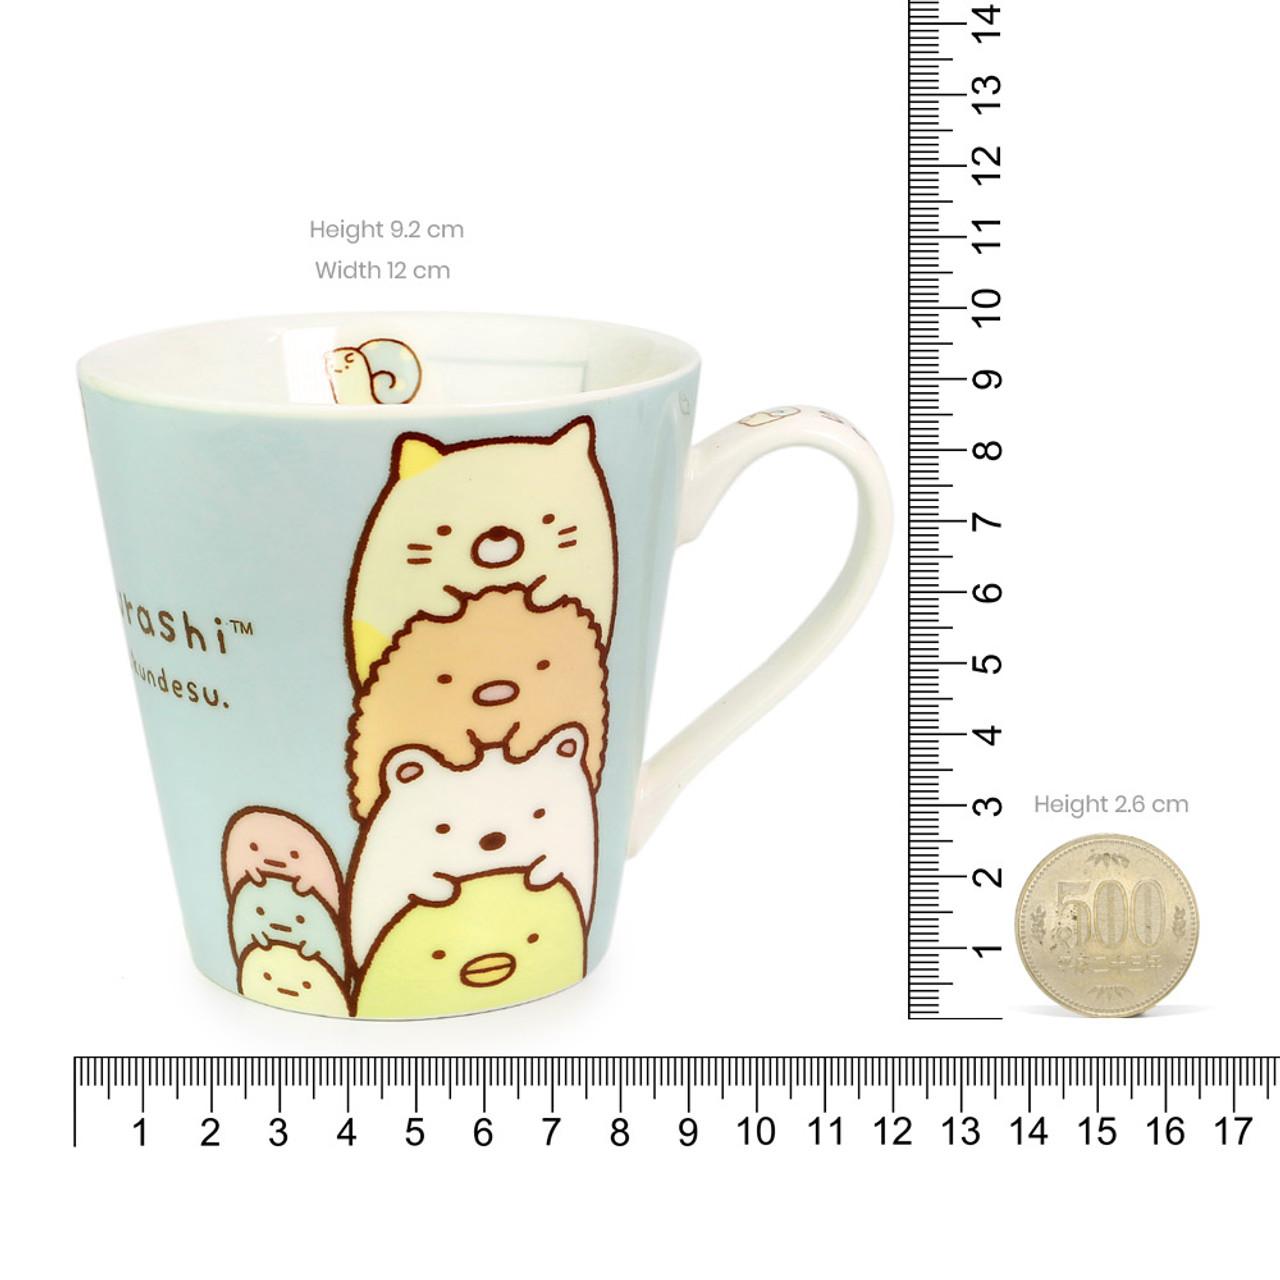 Sumikko Gurashi Measure Ceramic Mug - Vertical ( Proportion )